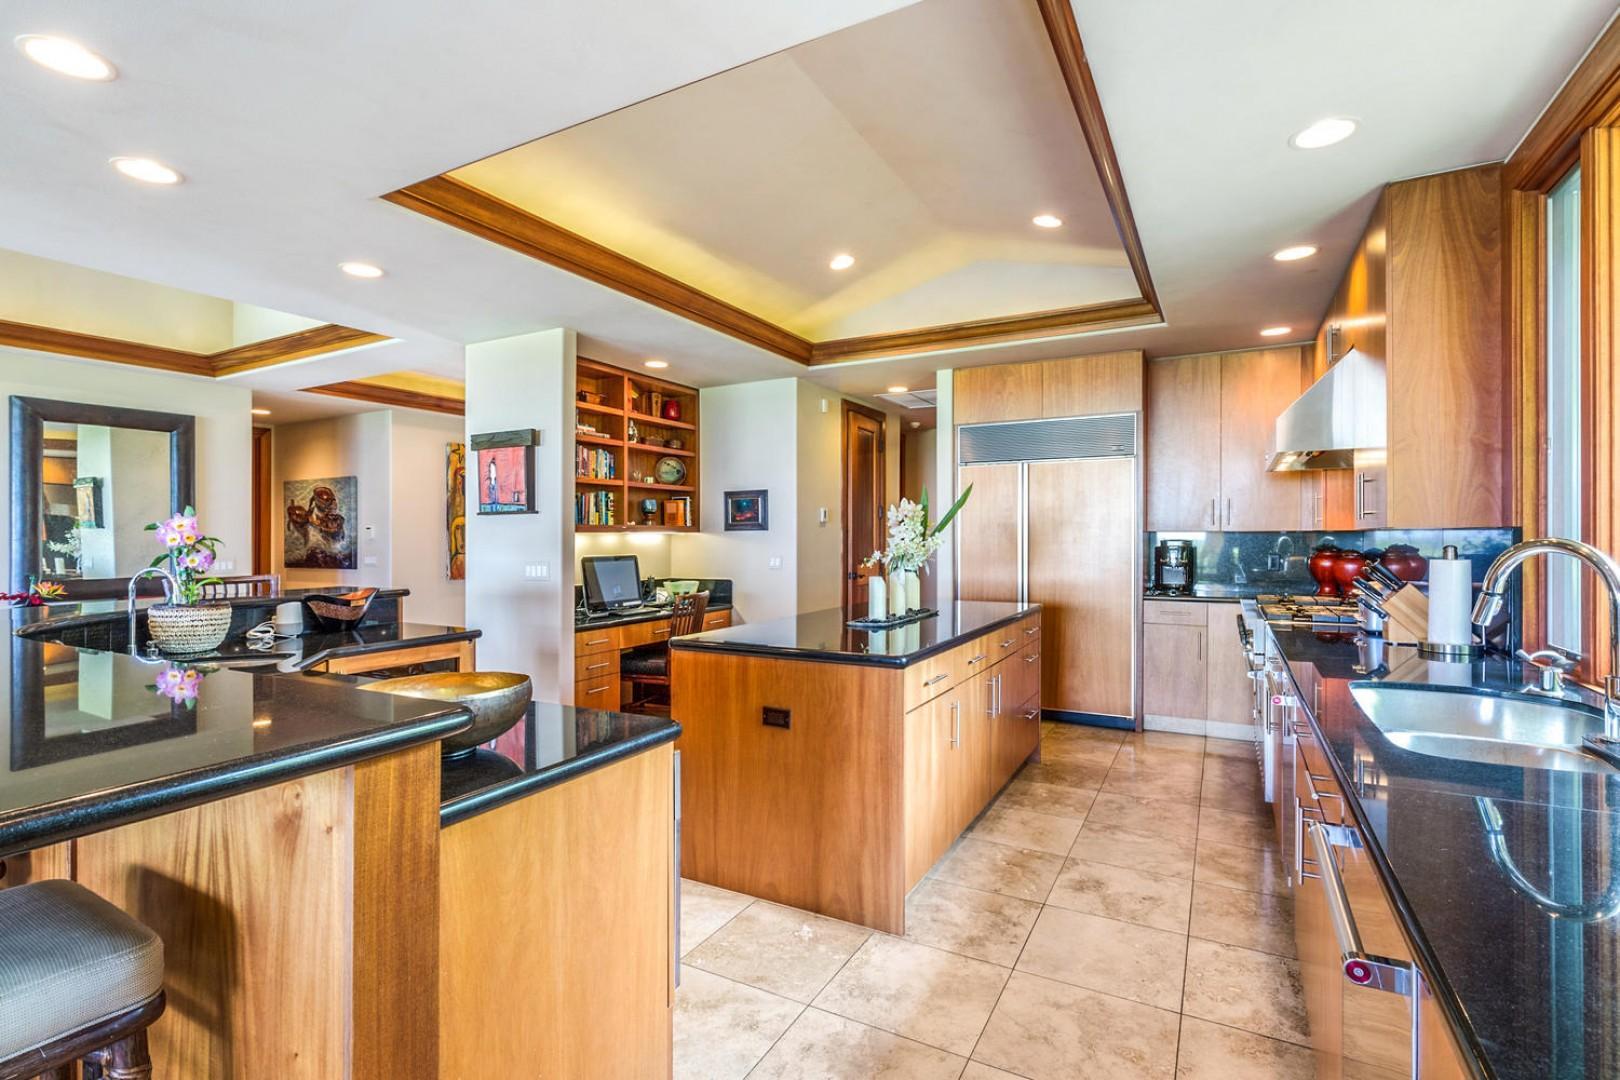 The gorgeous kitchen offers a bonus built-in desk area.